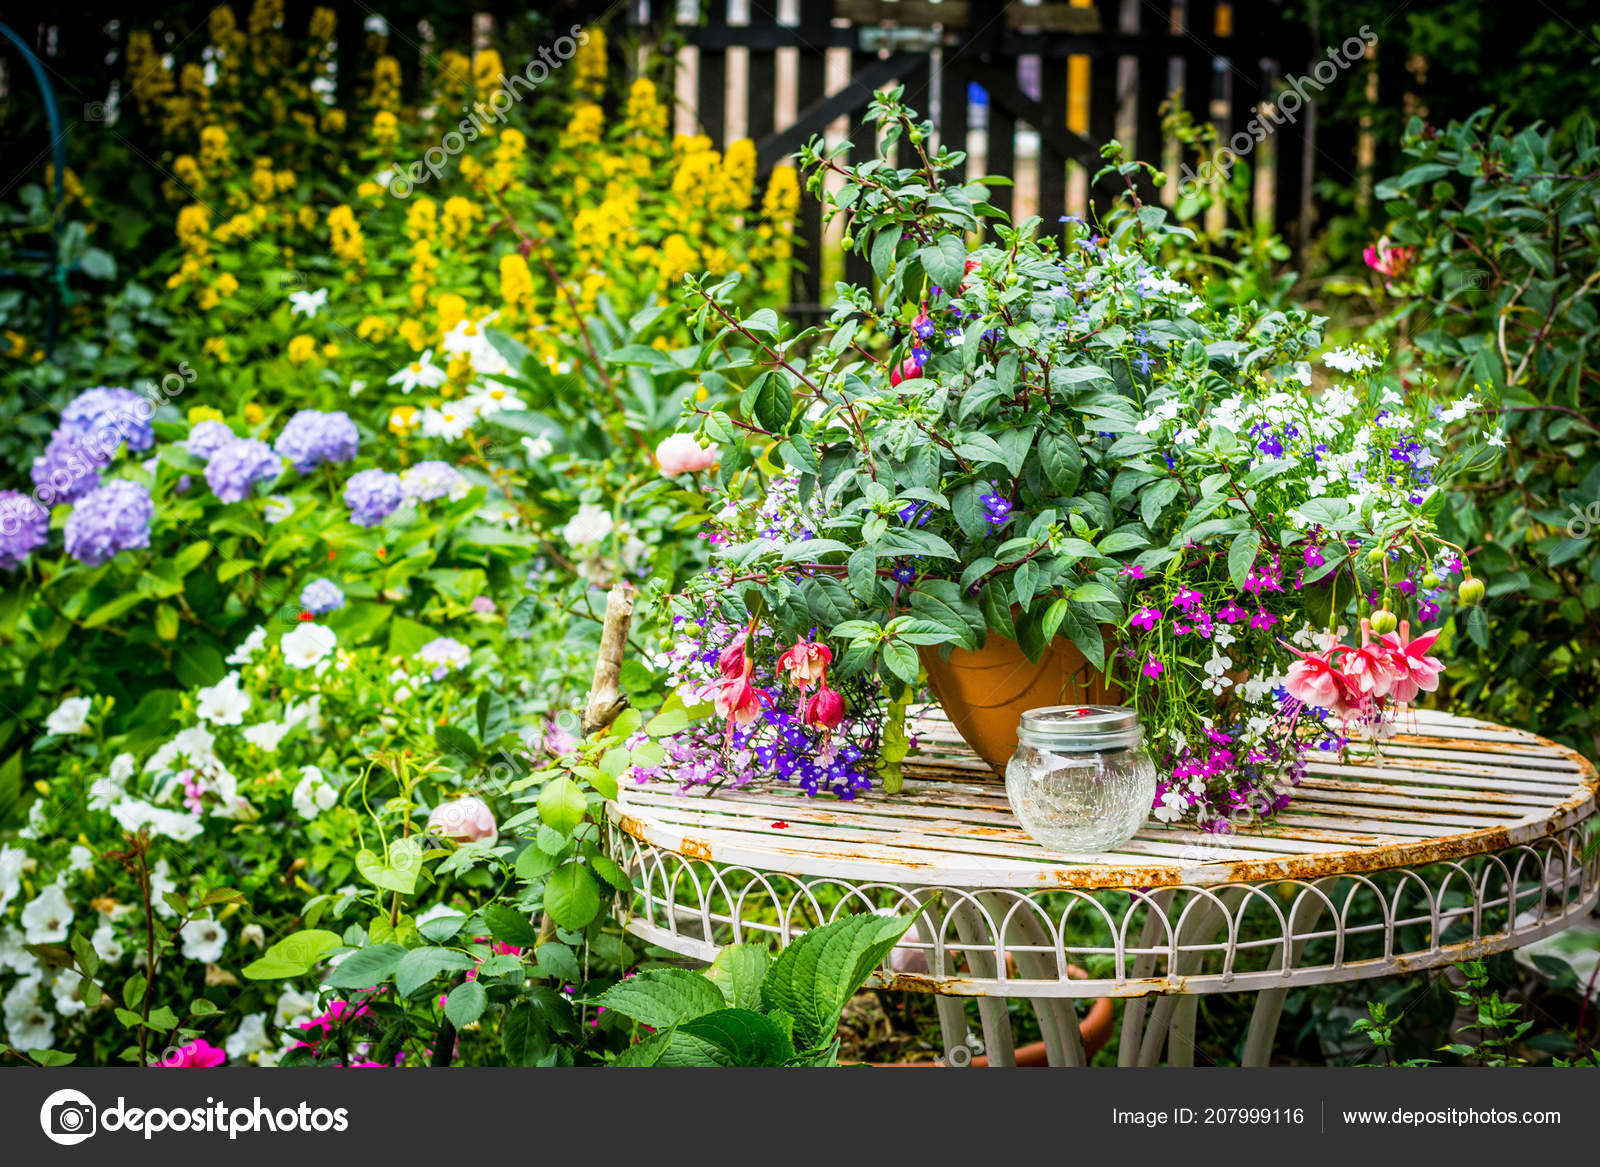 depositphotos stock photo beautiful home garden lots blooming